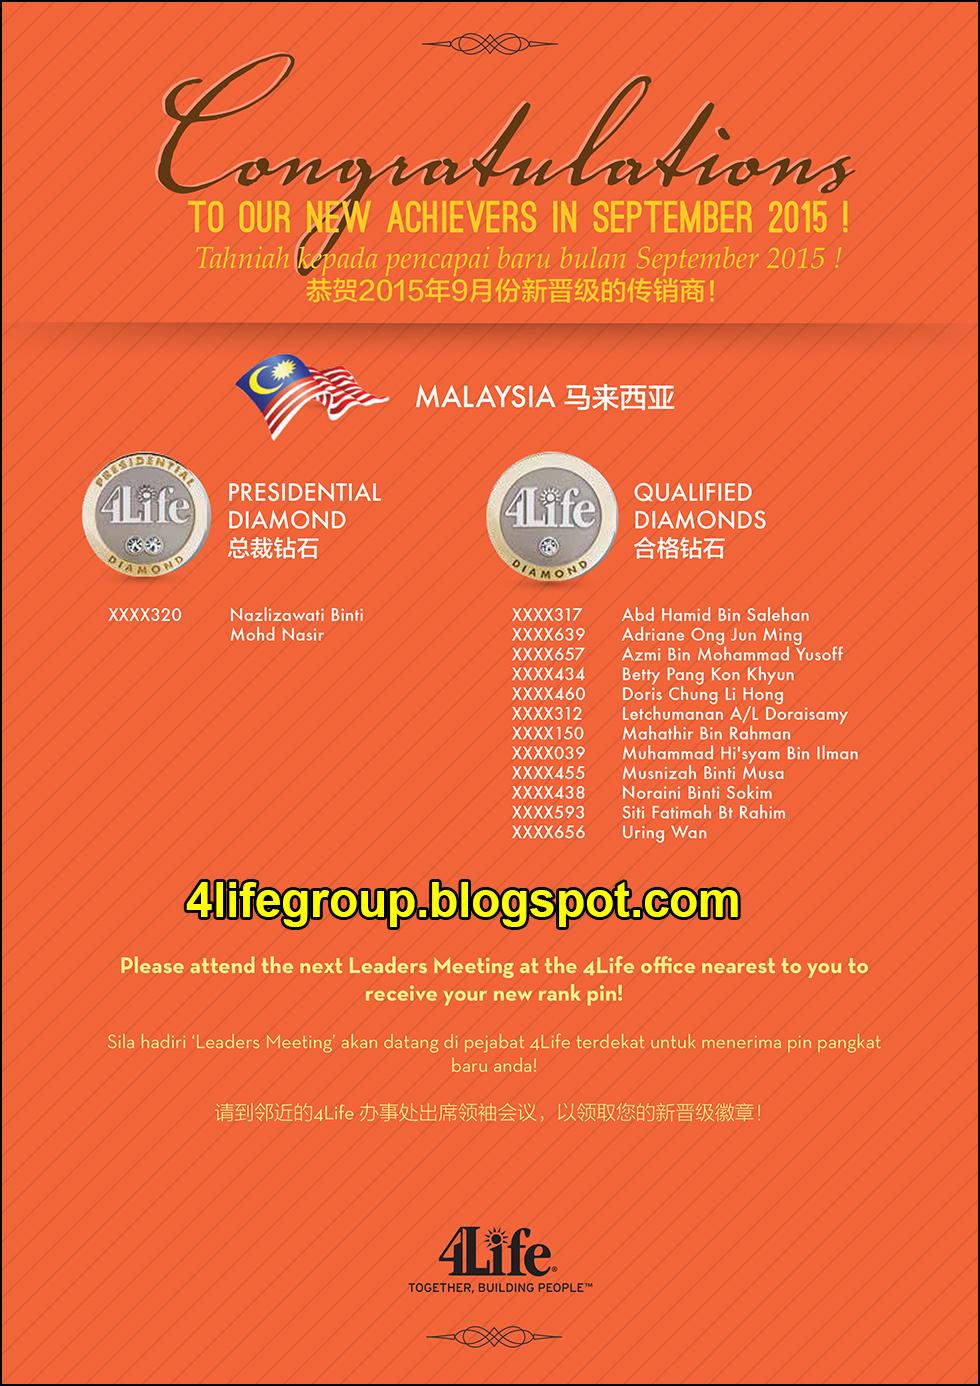 foto Pencapai Pangkat Baru September 2015 4Life Malaysia